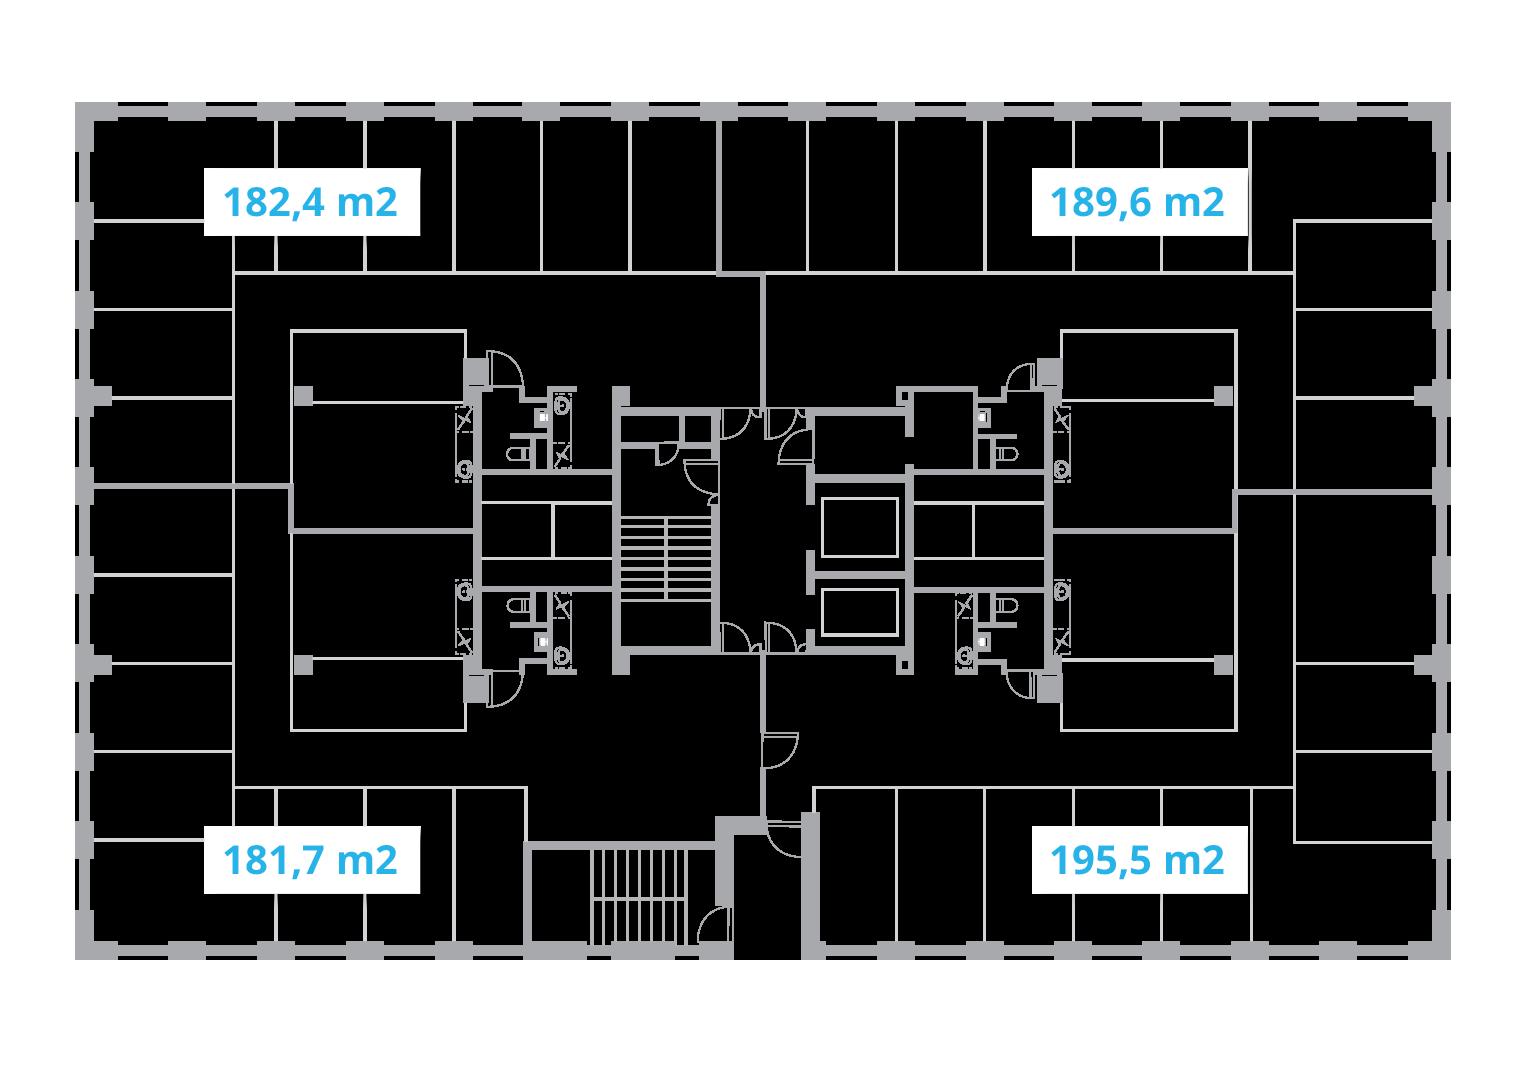 lootsa 12 technopolis Ulemiste example floor plan of the alexandre liwentaal office building